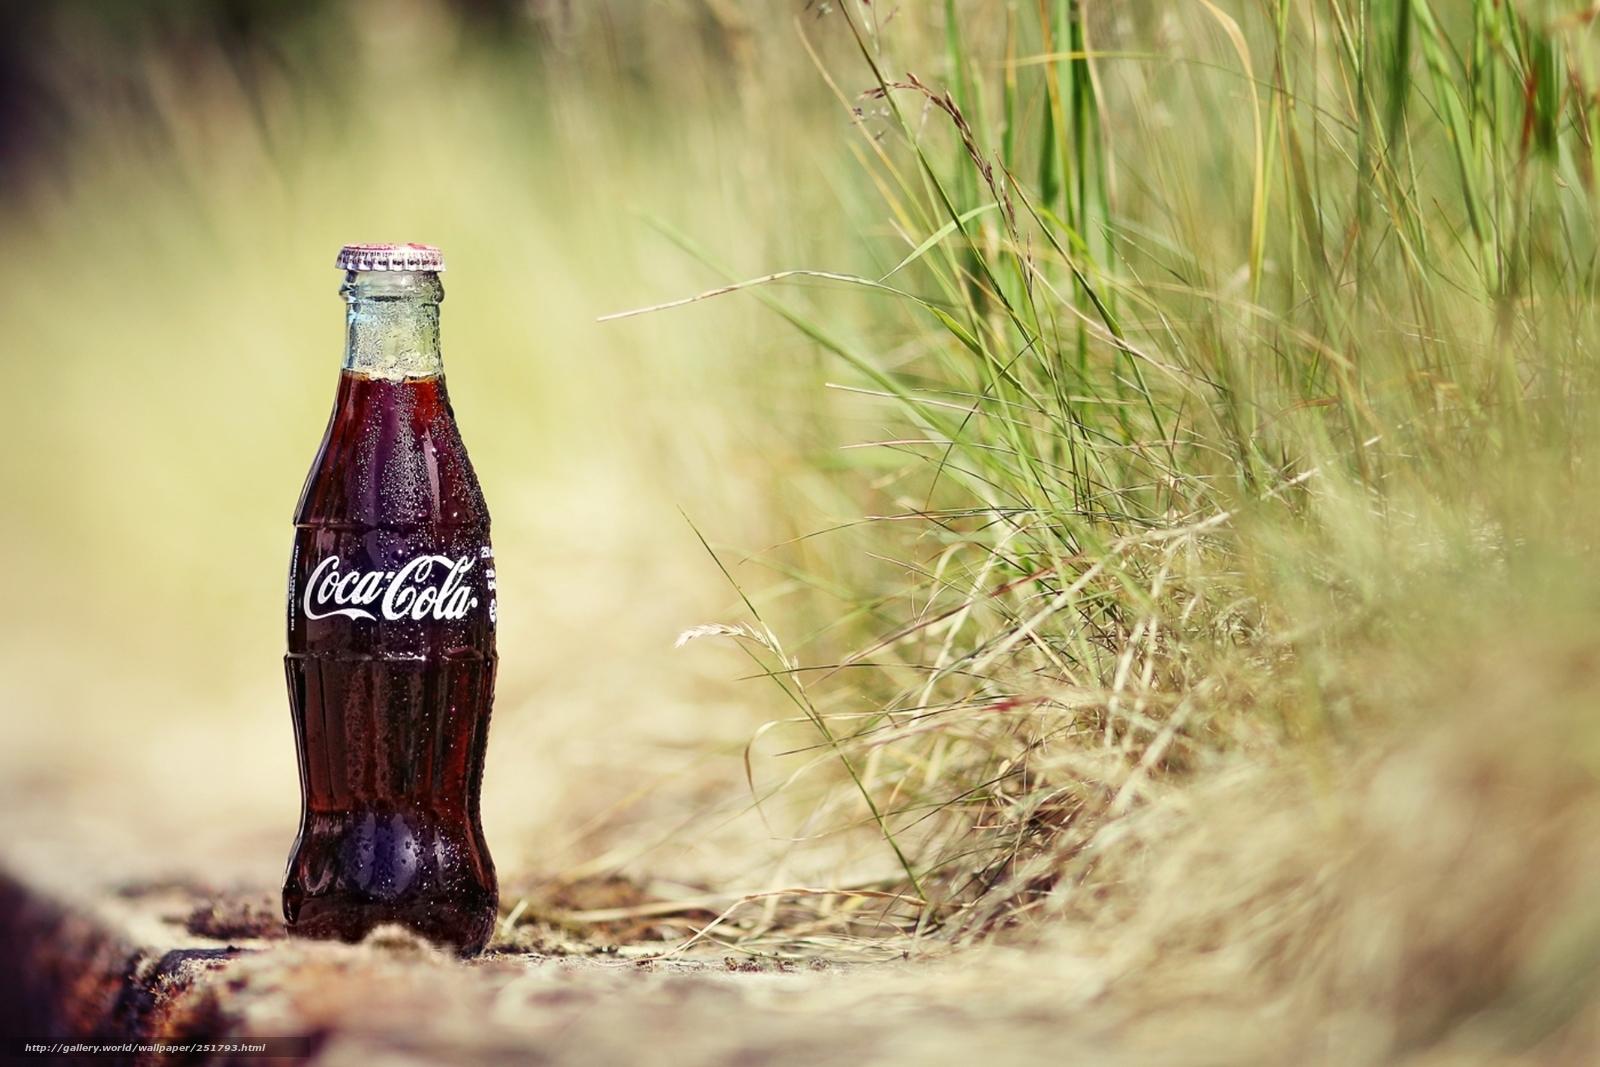 Фото бутылки банки в попе 22 фотография